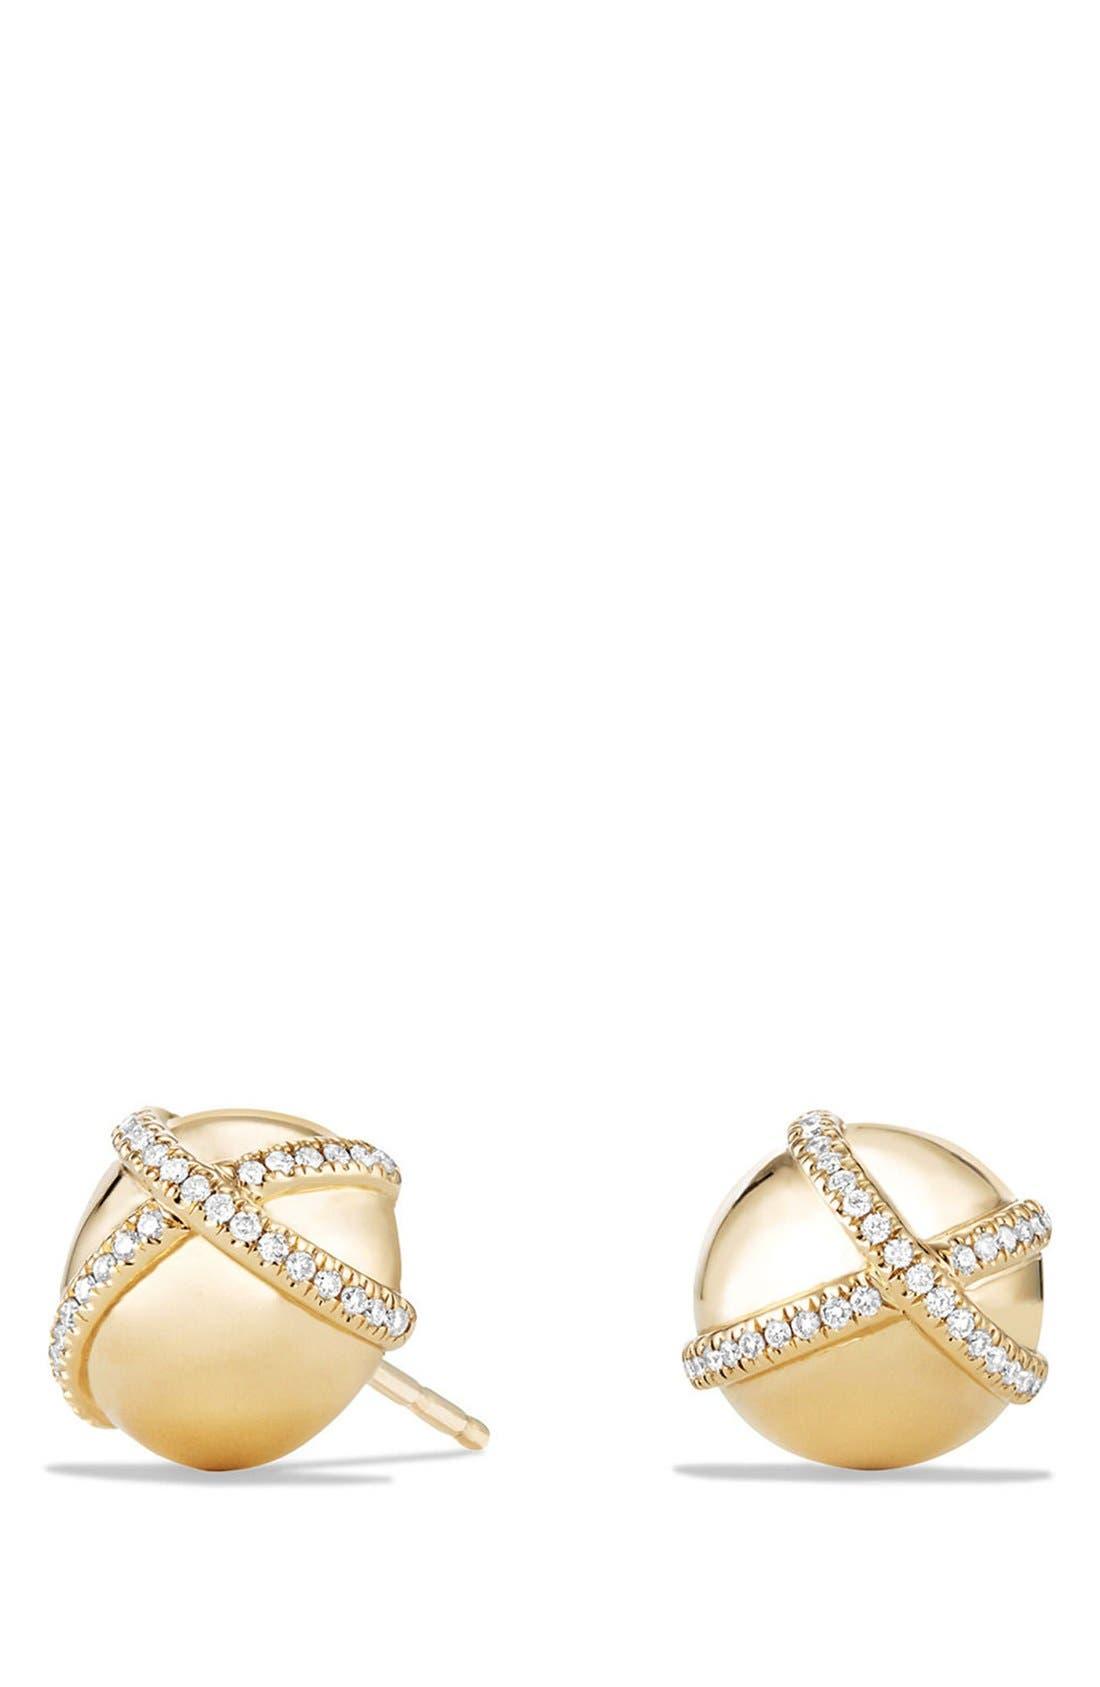 David Yurman 'Solari' Wrap Stud Earrings with Pavé Diamonds in 18K Gold